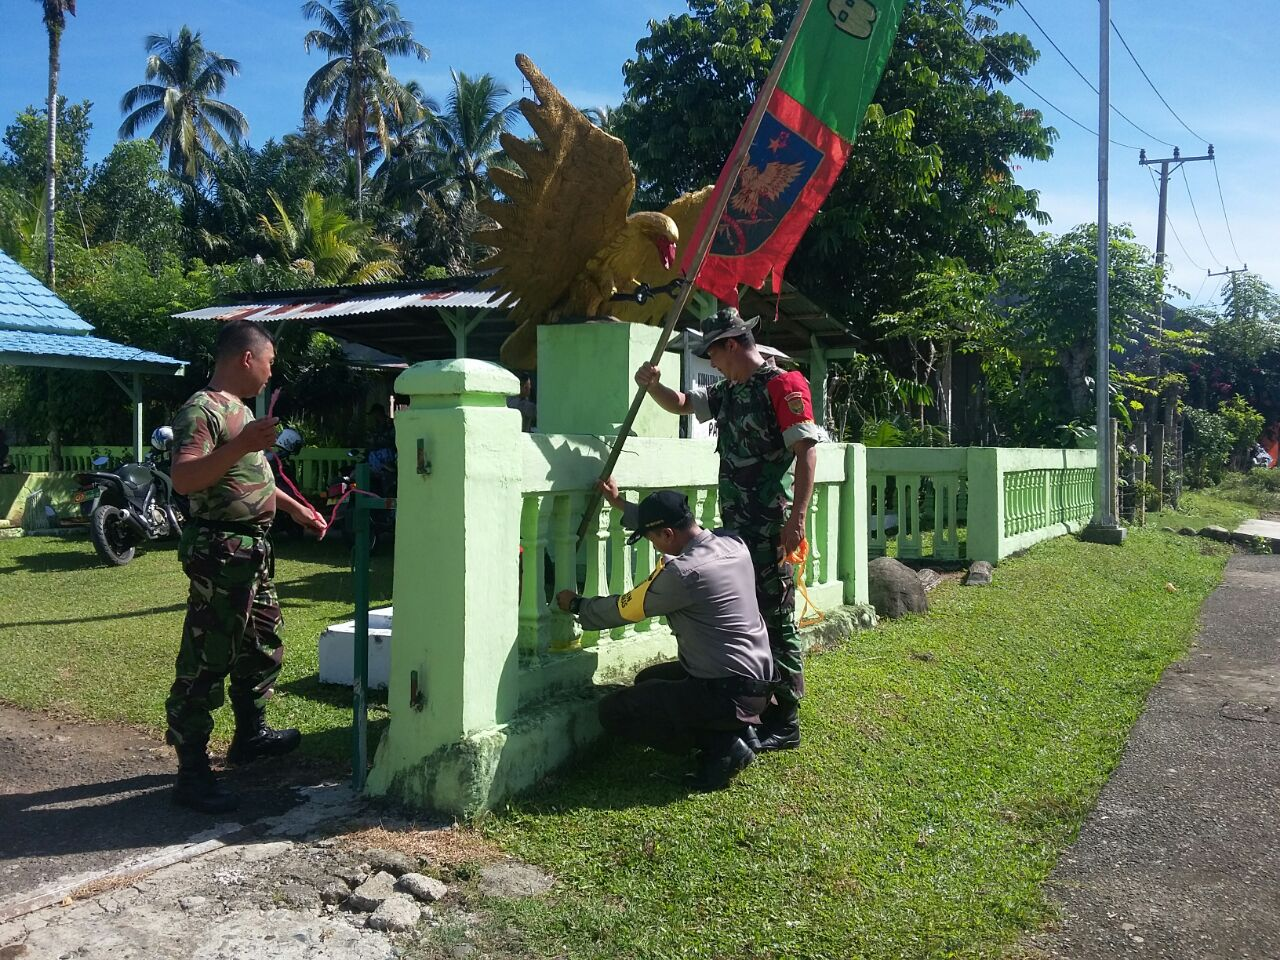 Sambang dan Silaturahmi, Polsek Kaur Utara Tingkatkan Sinergitas TNI/POLRI,